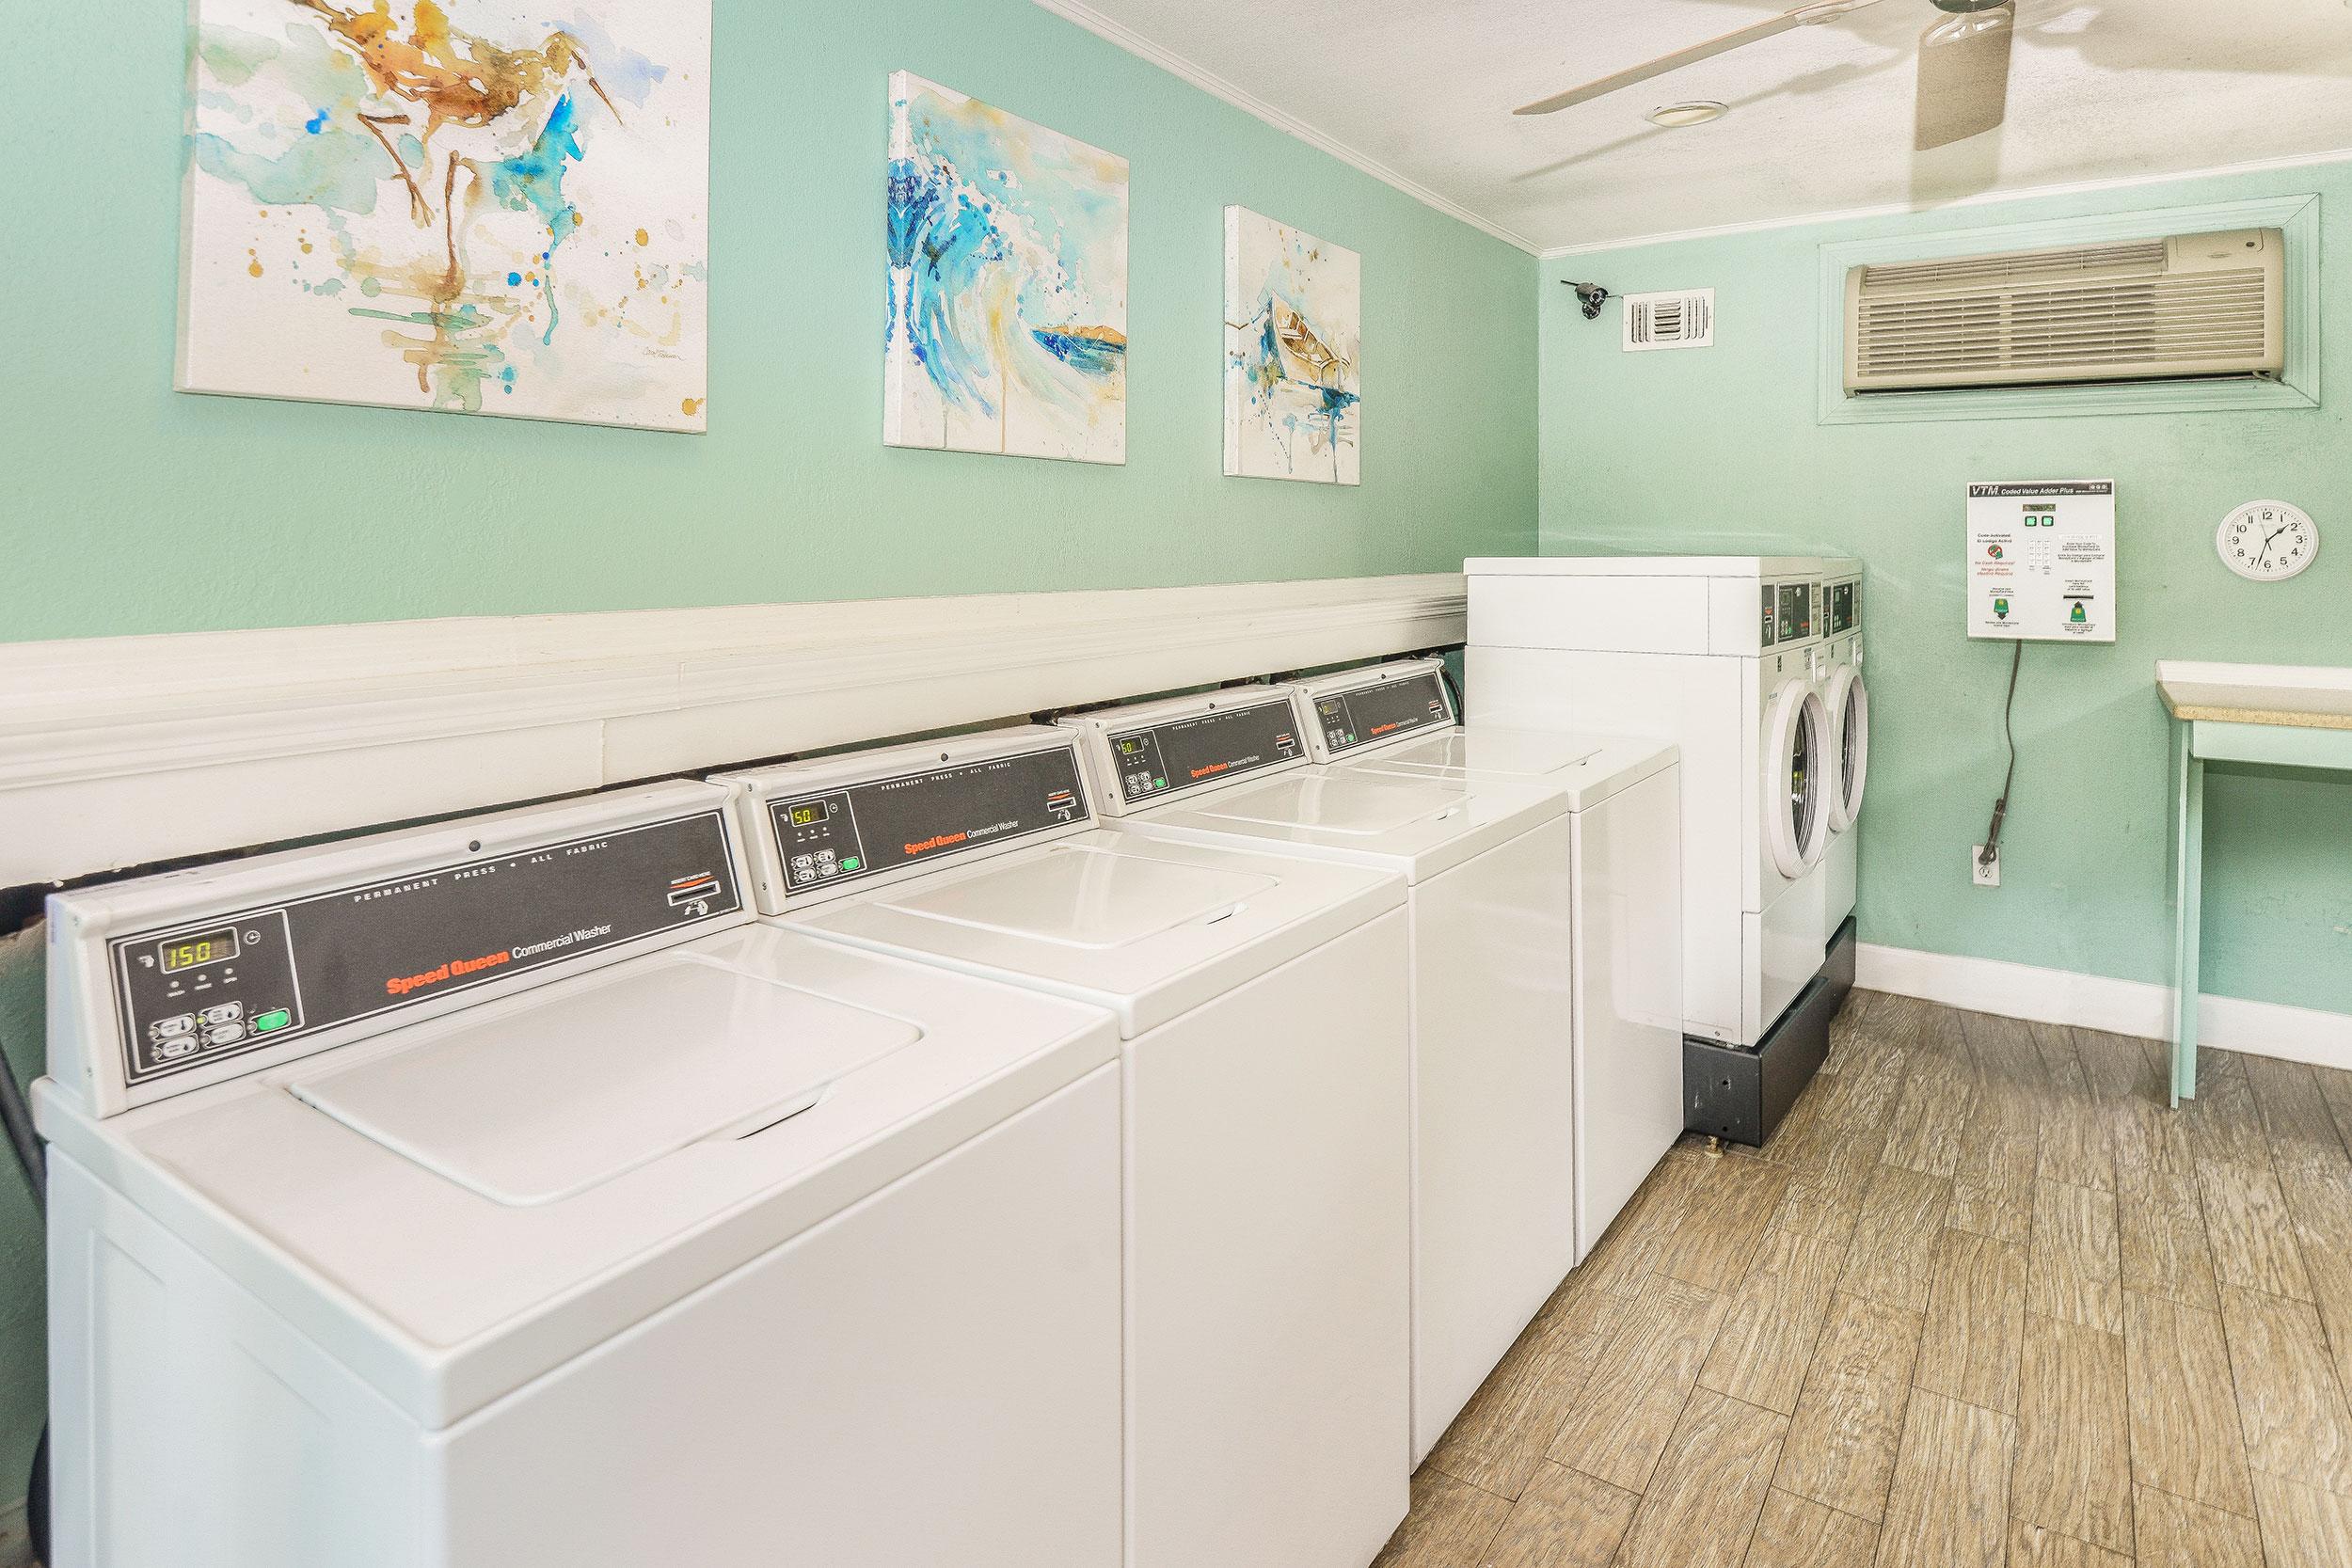 Mhf-amen-laundry-center